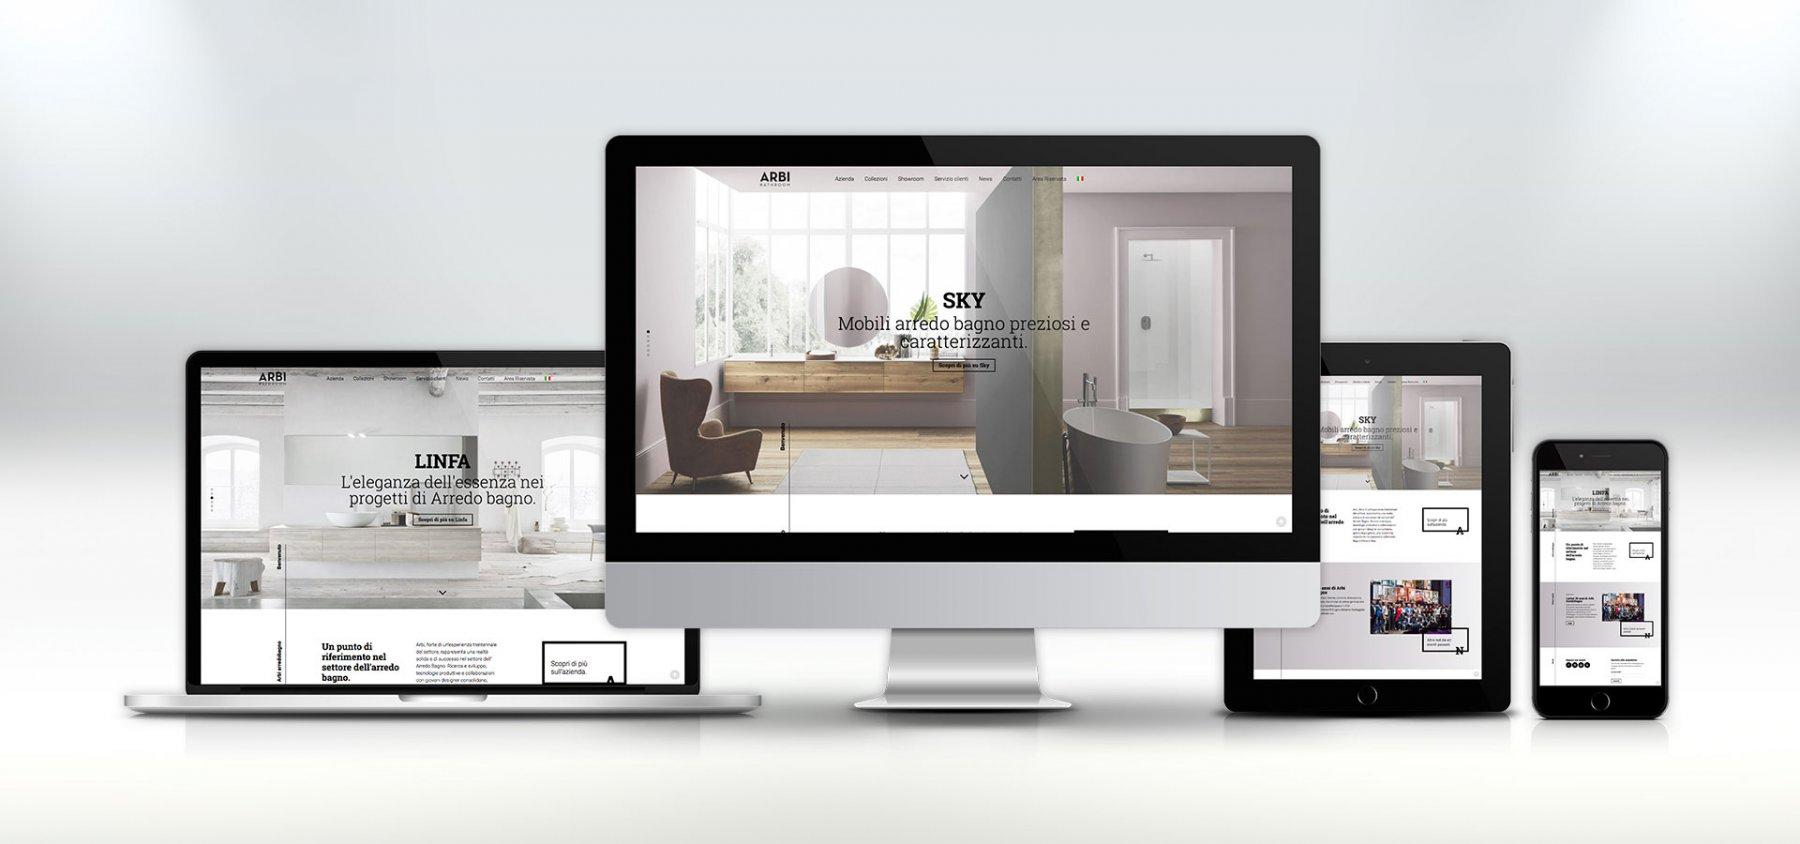 sviluppo sito web responsive arbi